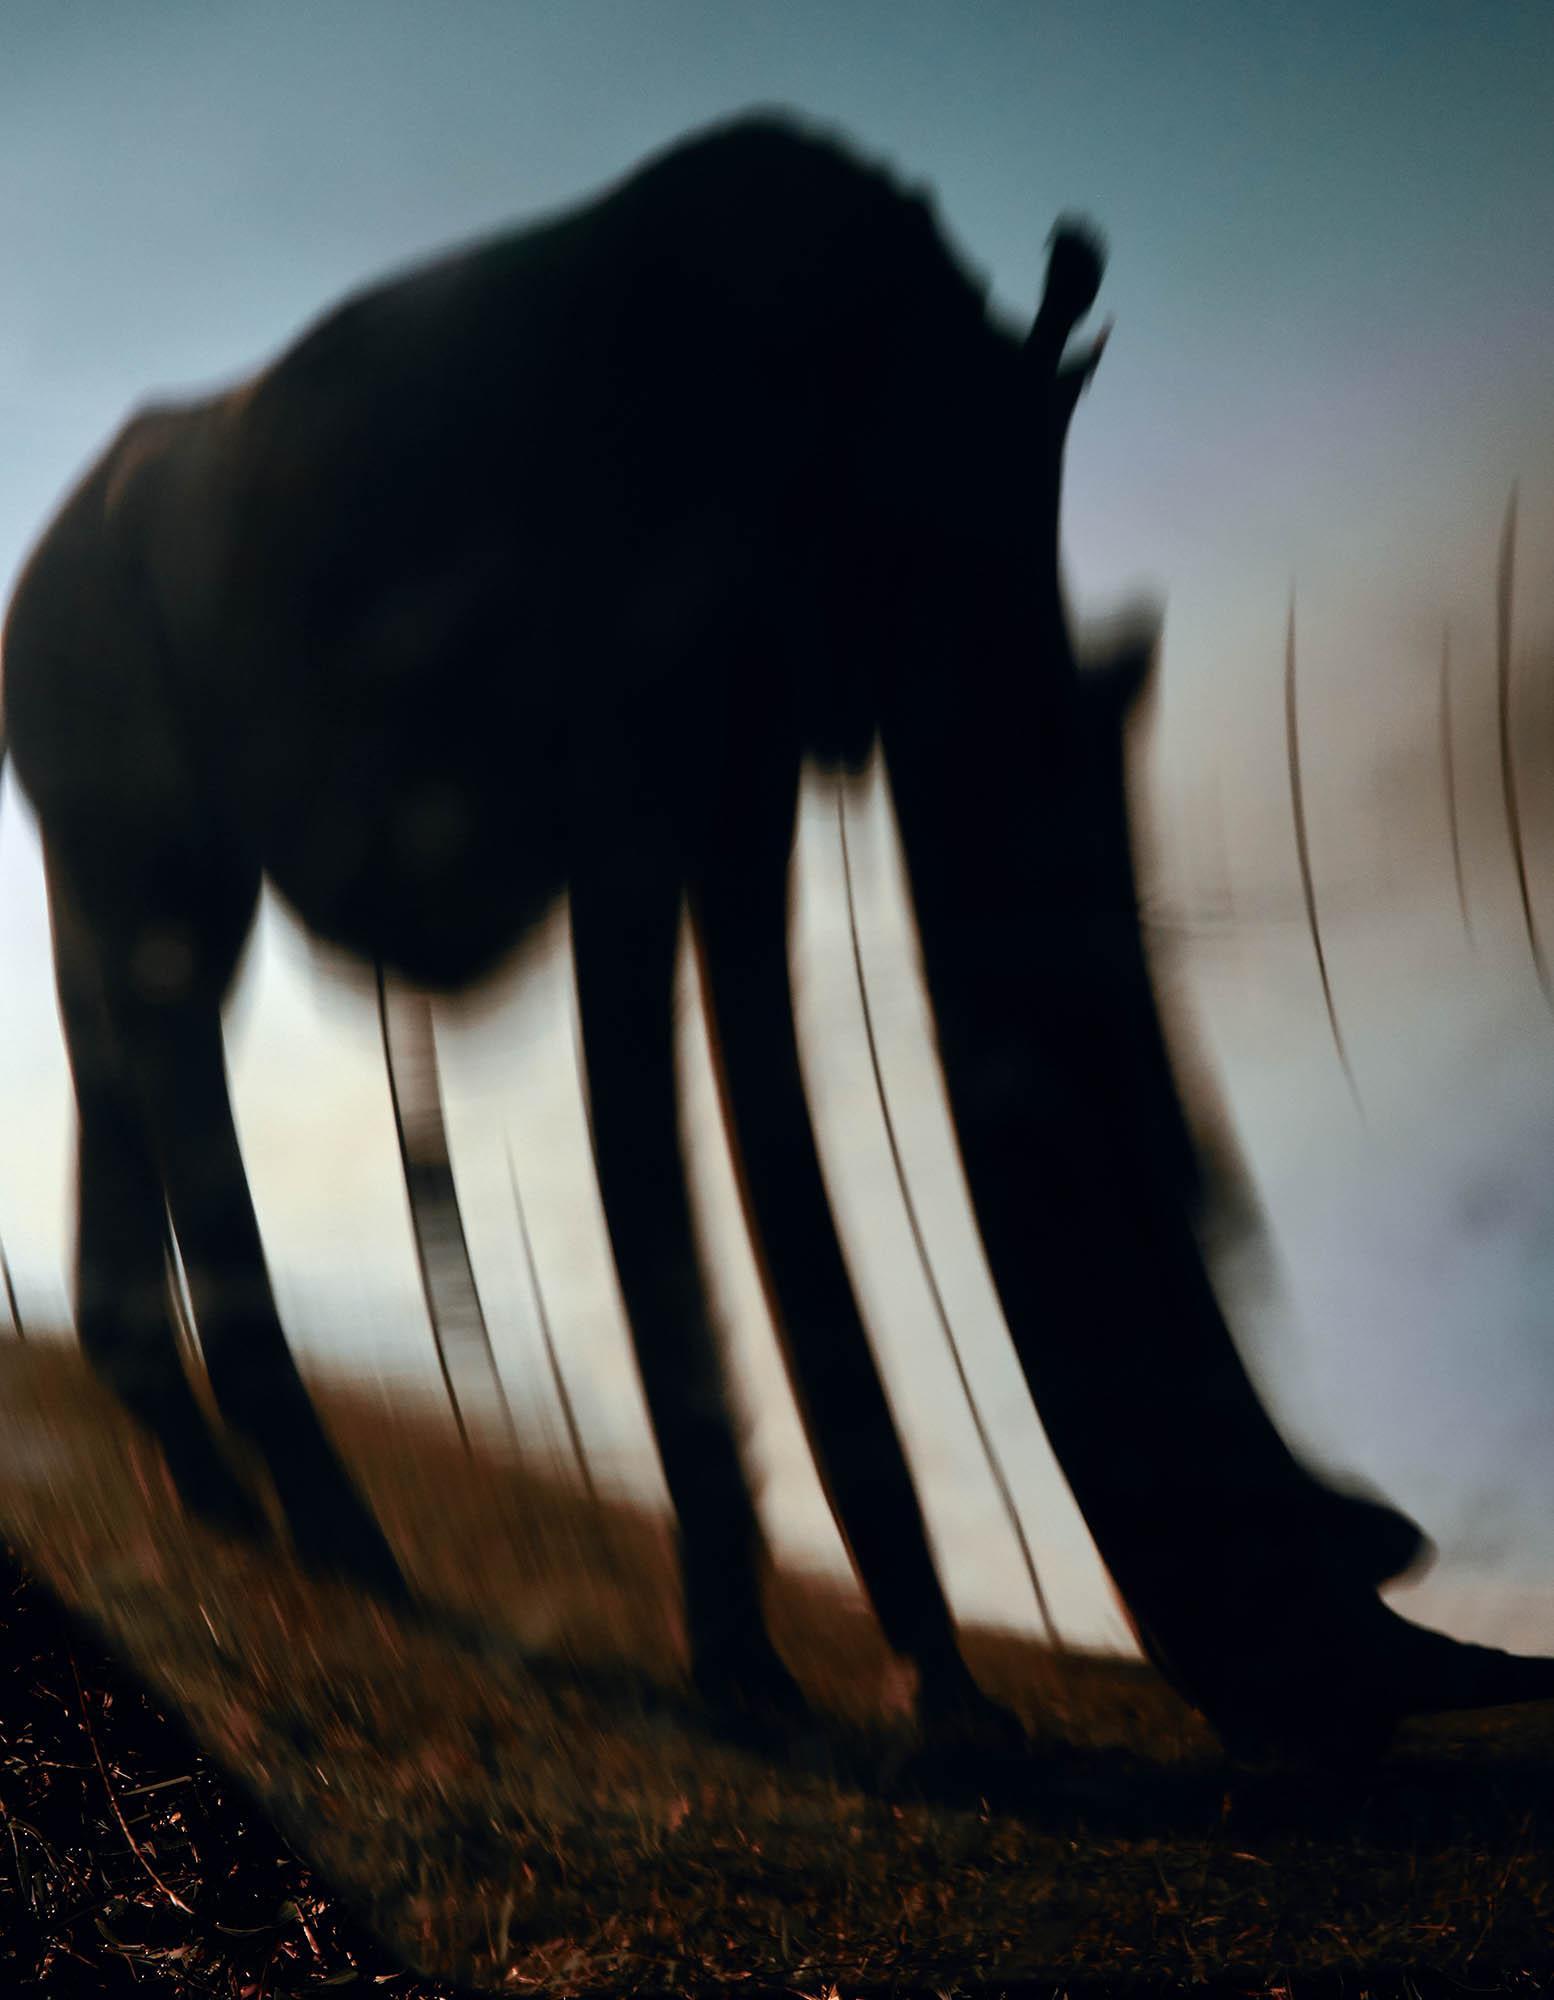 Photographer Jack Davison finds hope in the quiet of extinction